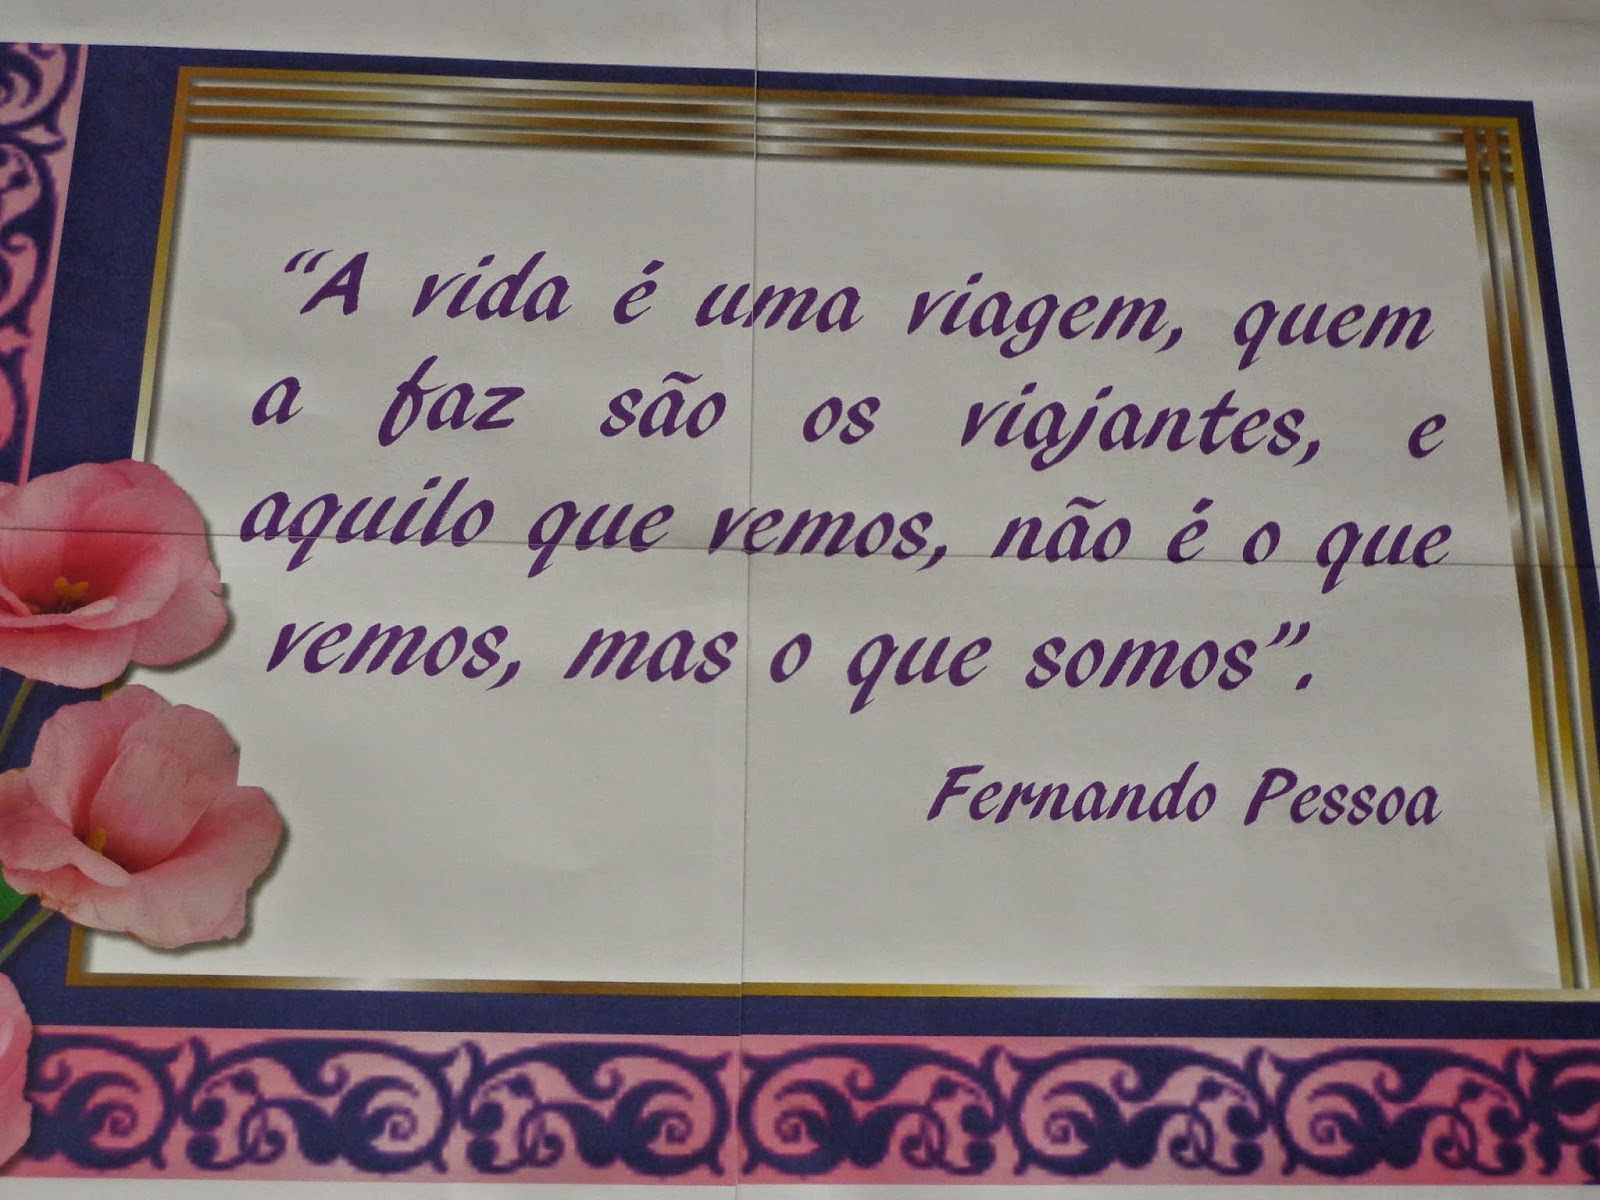 EEFM Antônio Vidal: Campanha Estudar Vale A Pena